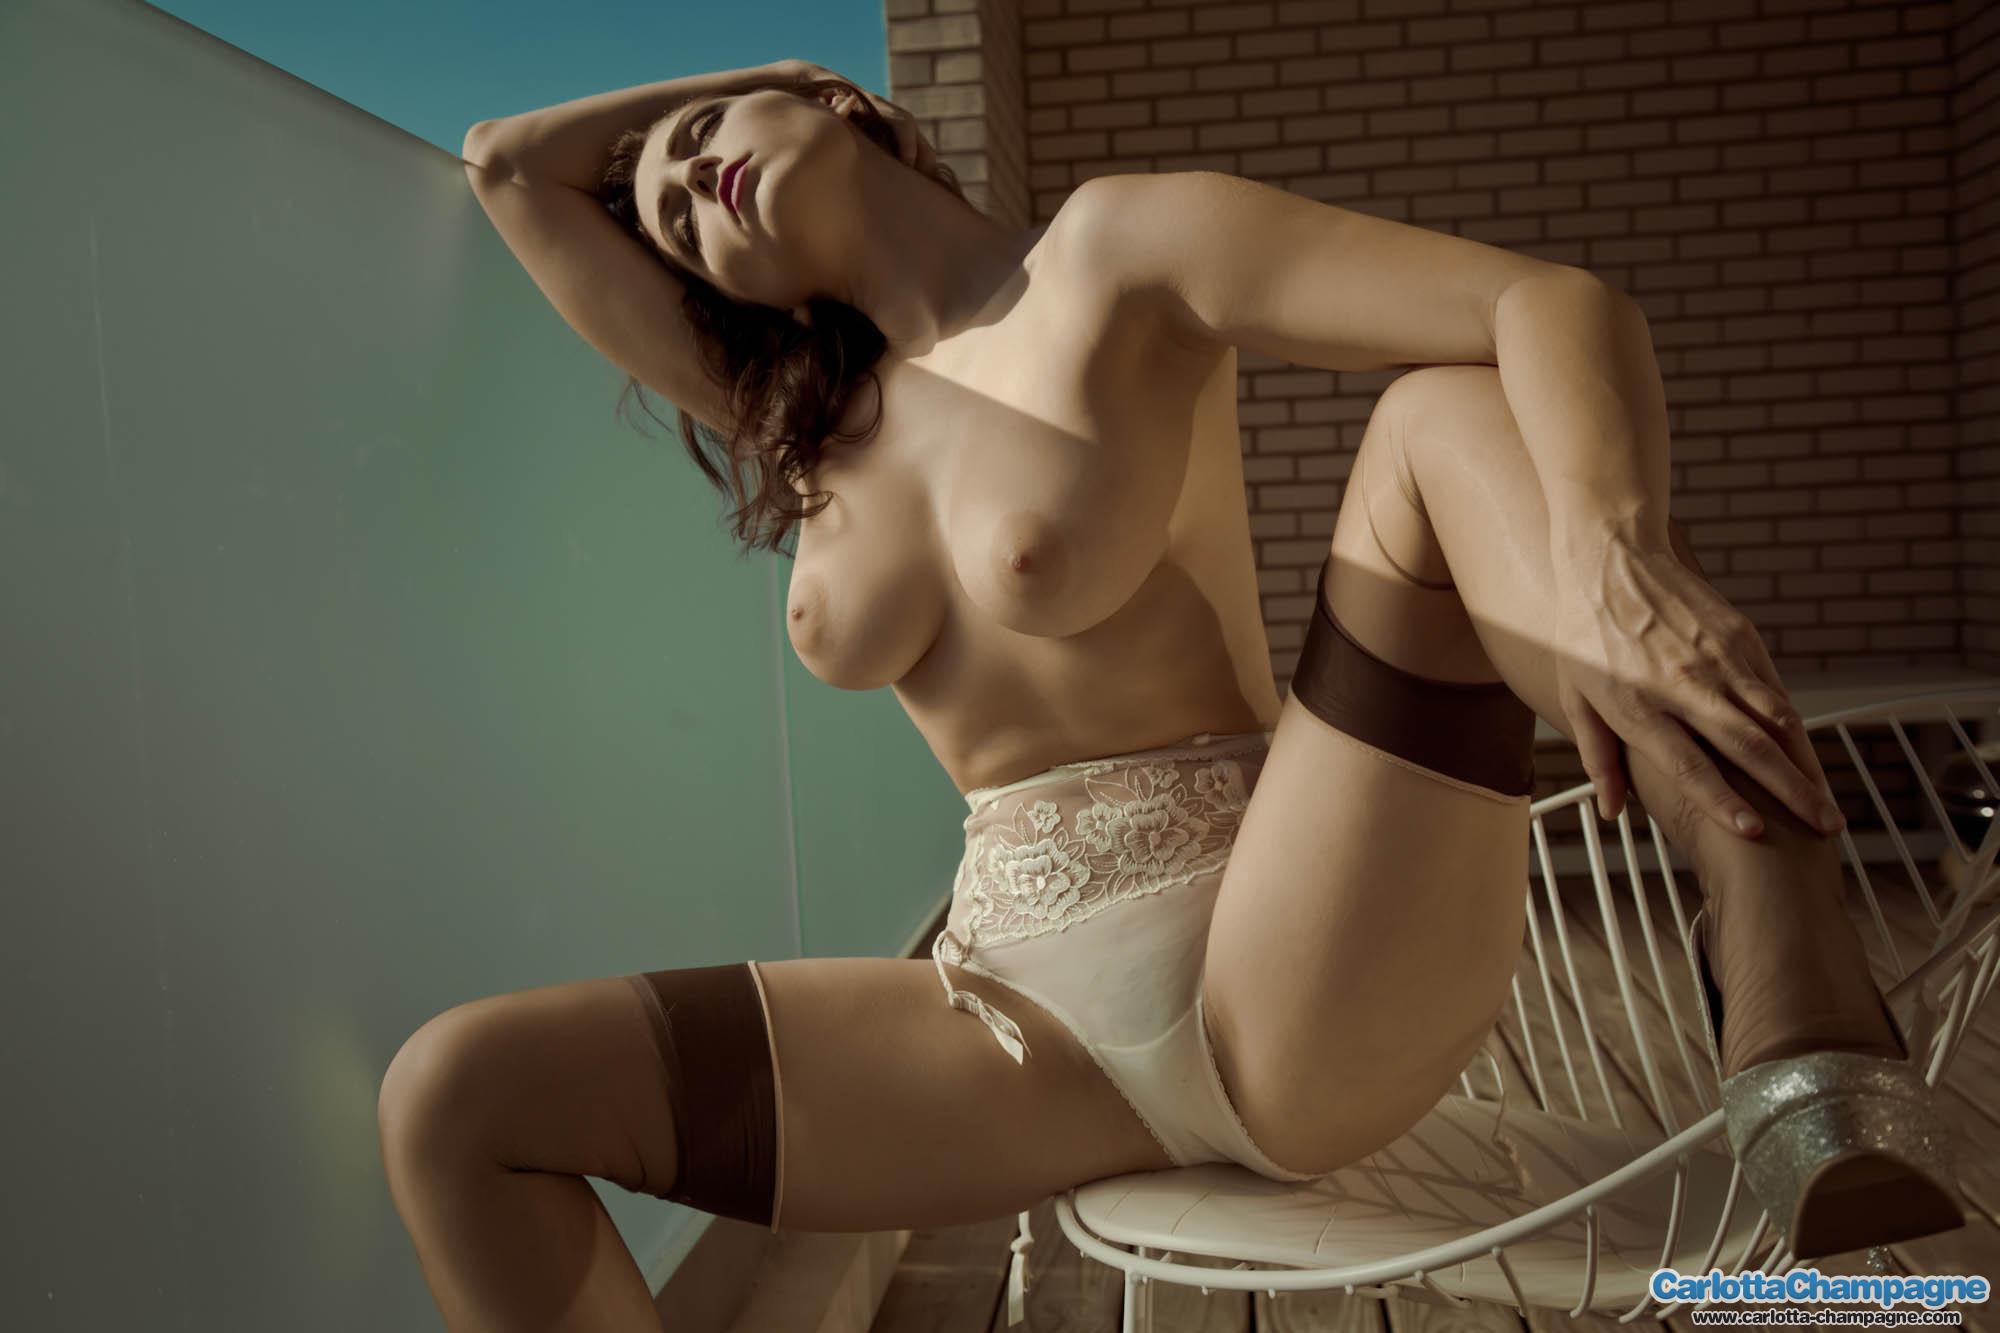 carlotta-champagne-tits-balcony-stockings-garters-nude-08